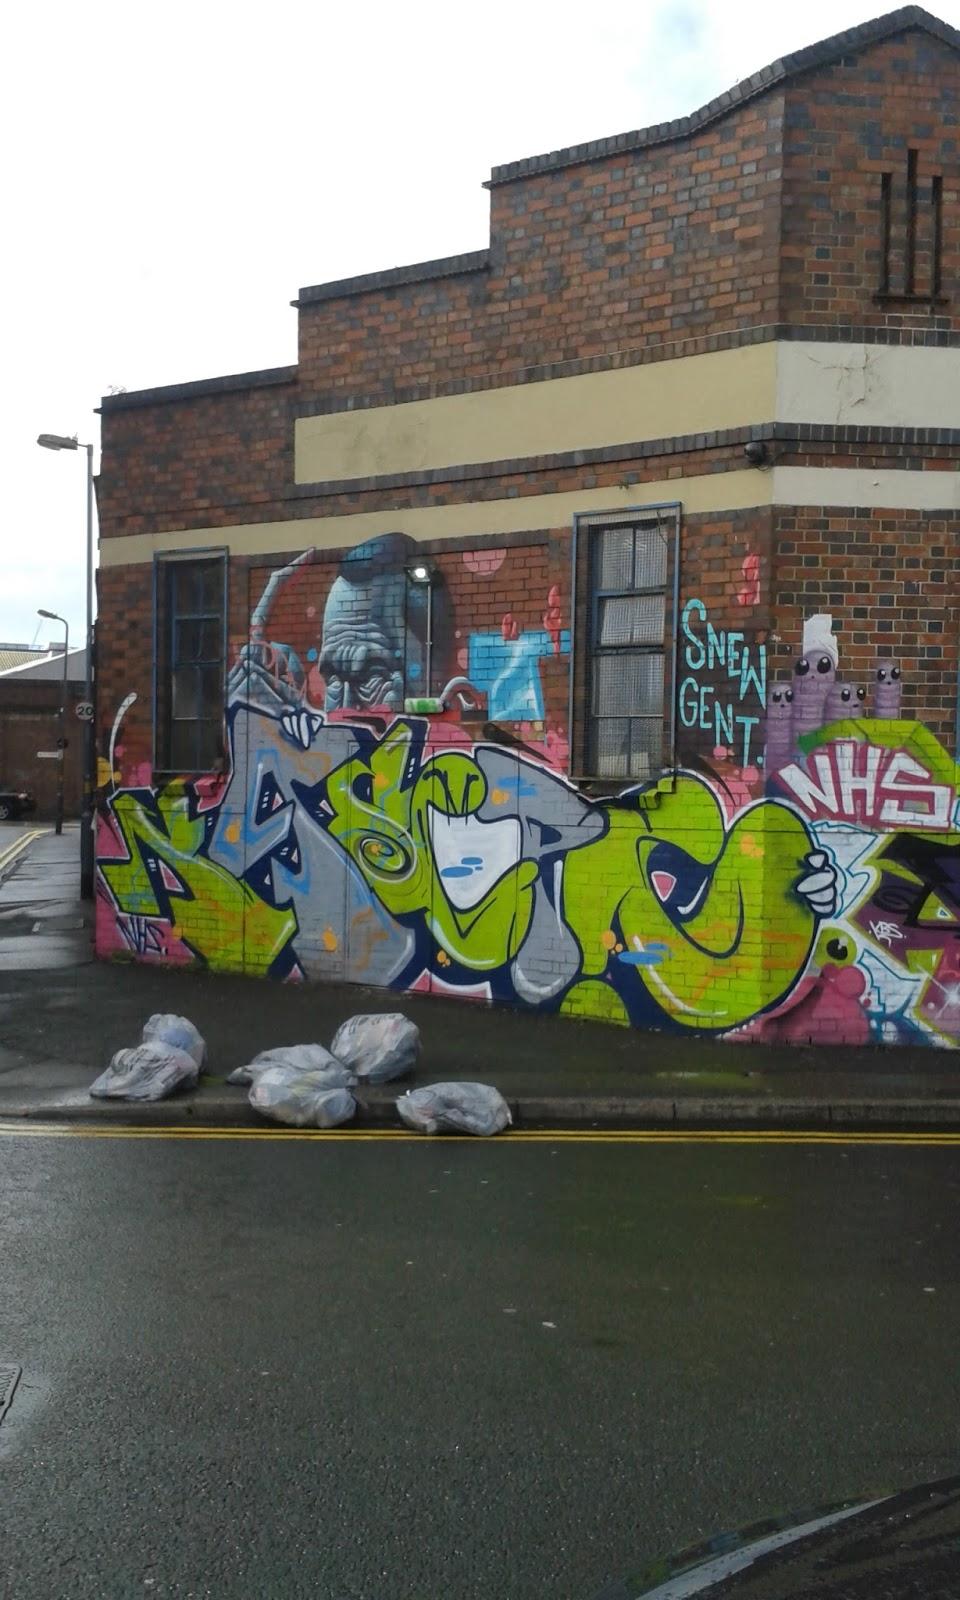 Art There Are Many Graffiti